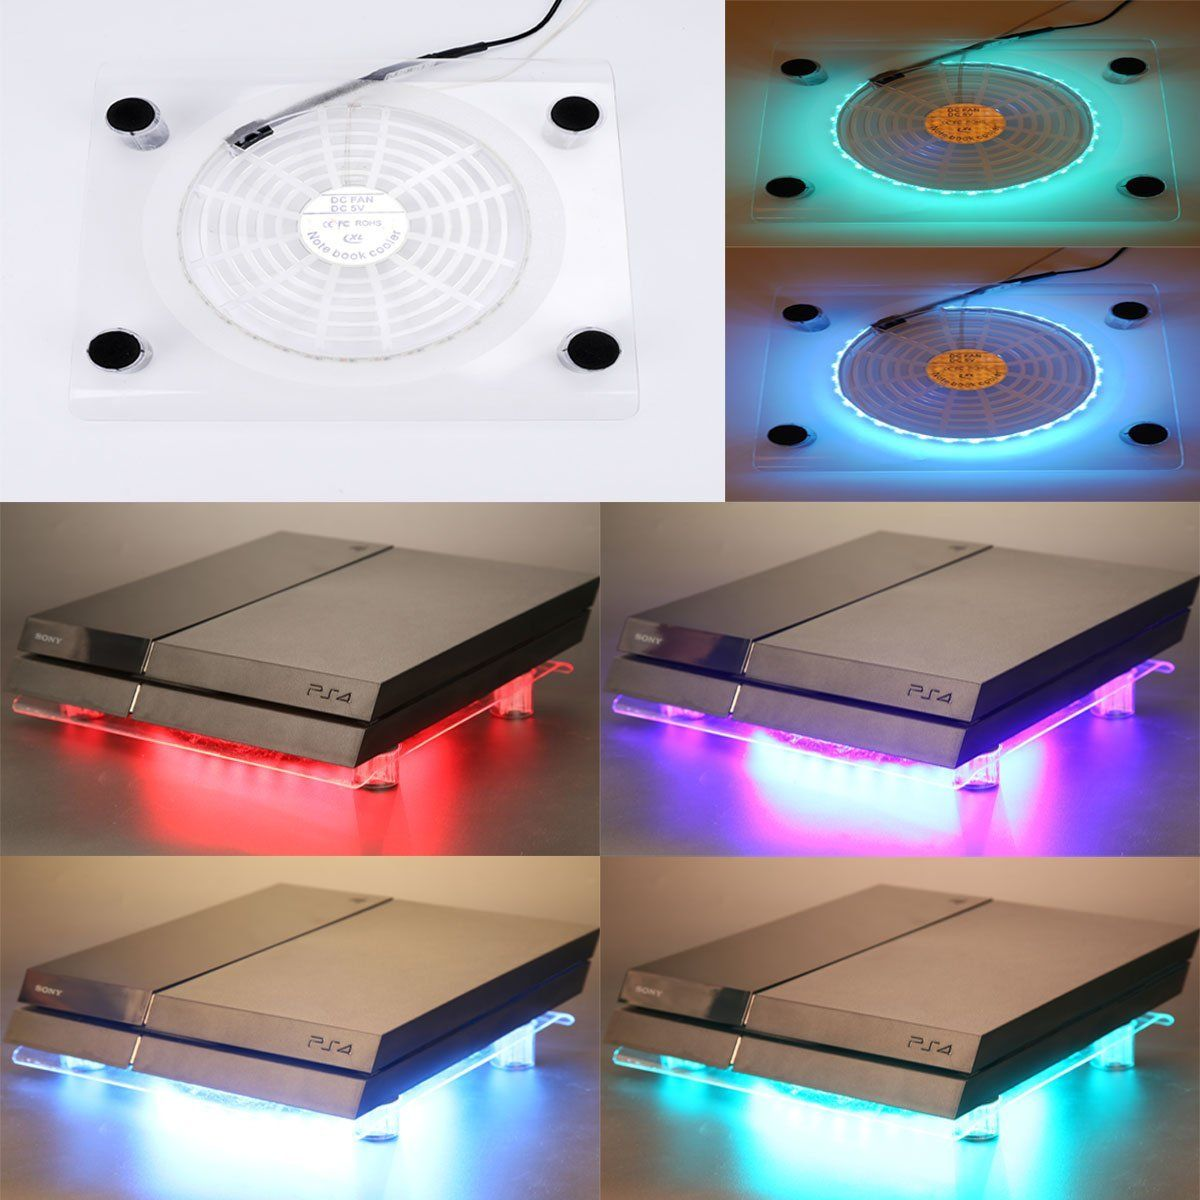 Wowled Usb Rgb Led Design Cooler Cooling Transparent Fan Pad